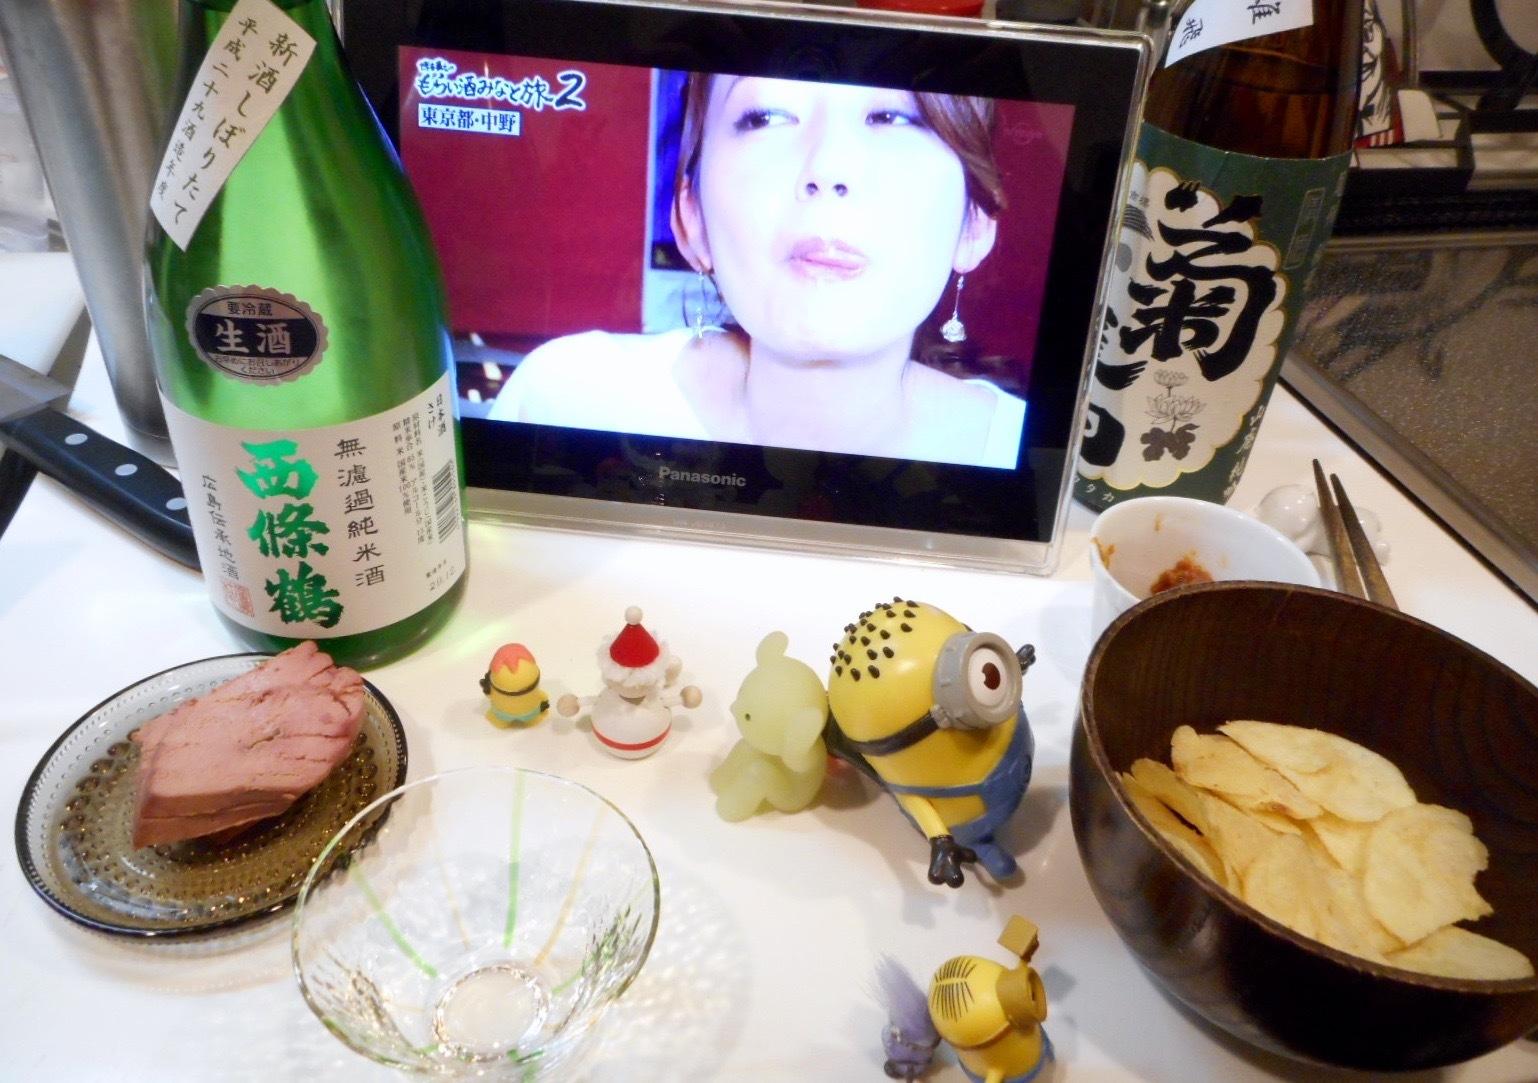 saijoutsuru_siboritate29by4.jpg